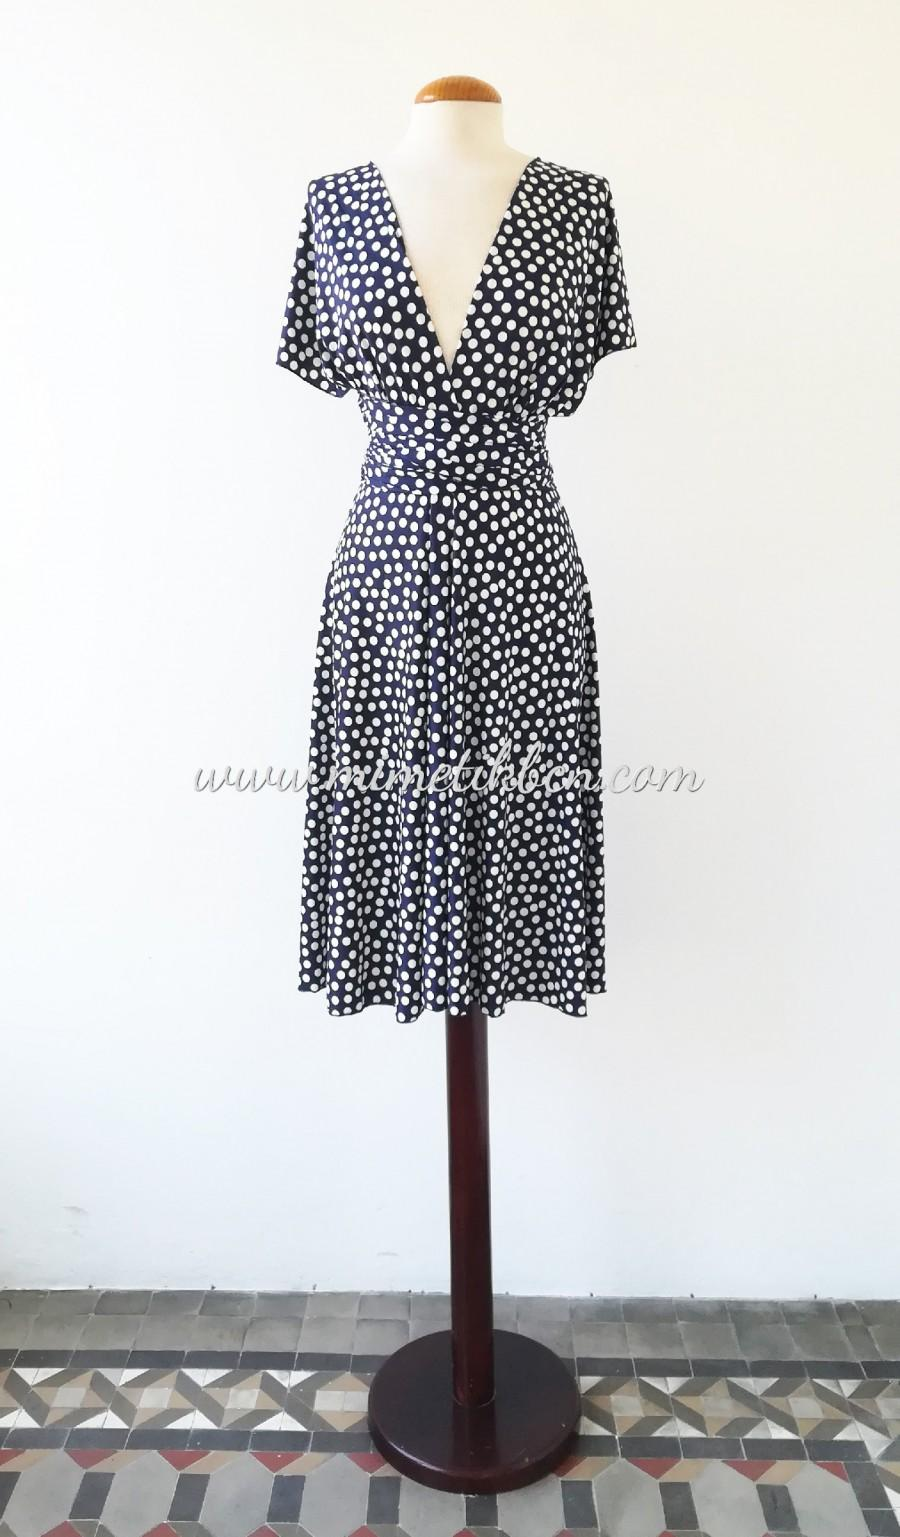 Hochzeit - Retro dress short, Polka dot tea dress, Retro vintage inspired dress, Blue & White Polka Dot, Rockabilly dress, Pinup polka dot dress blue